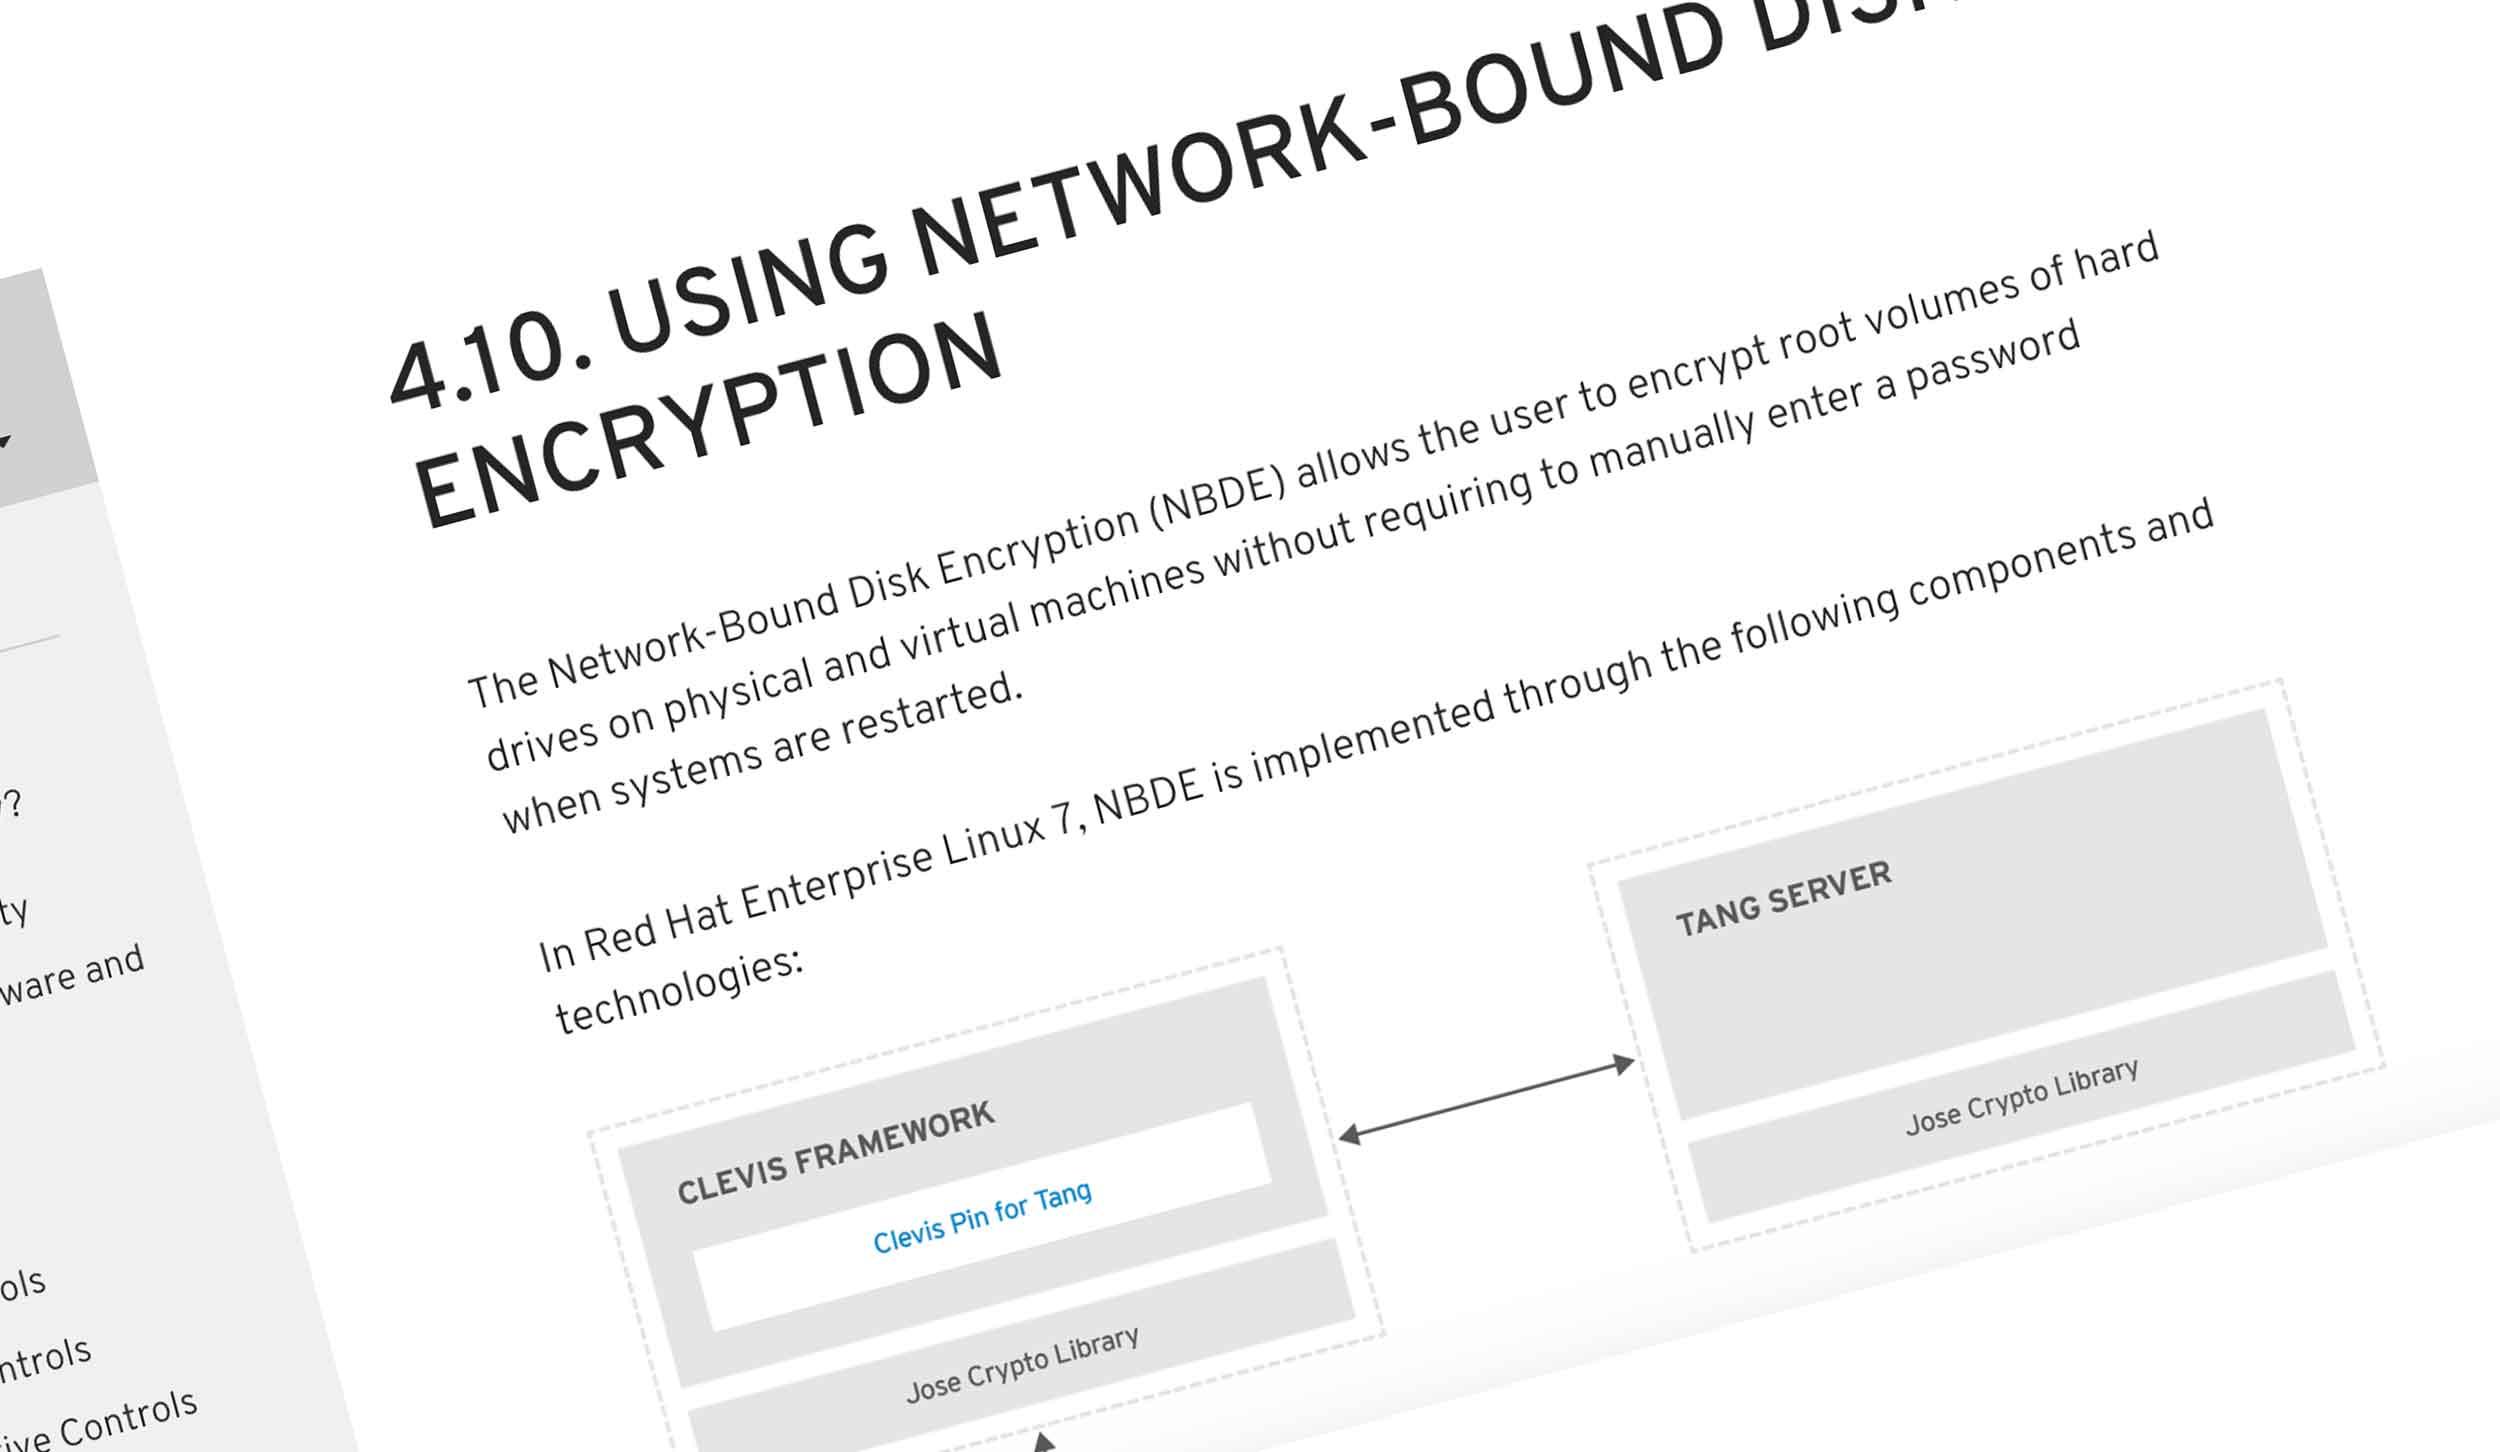 Network Bound Disk Encryption